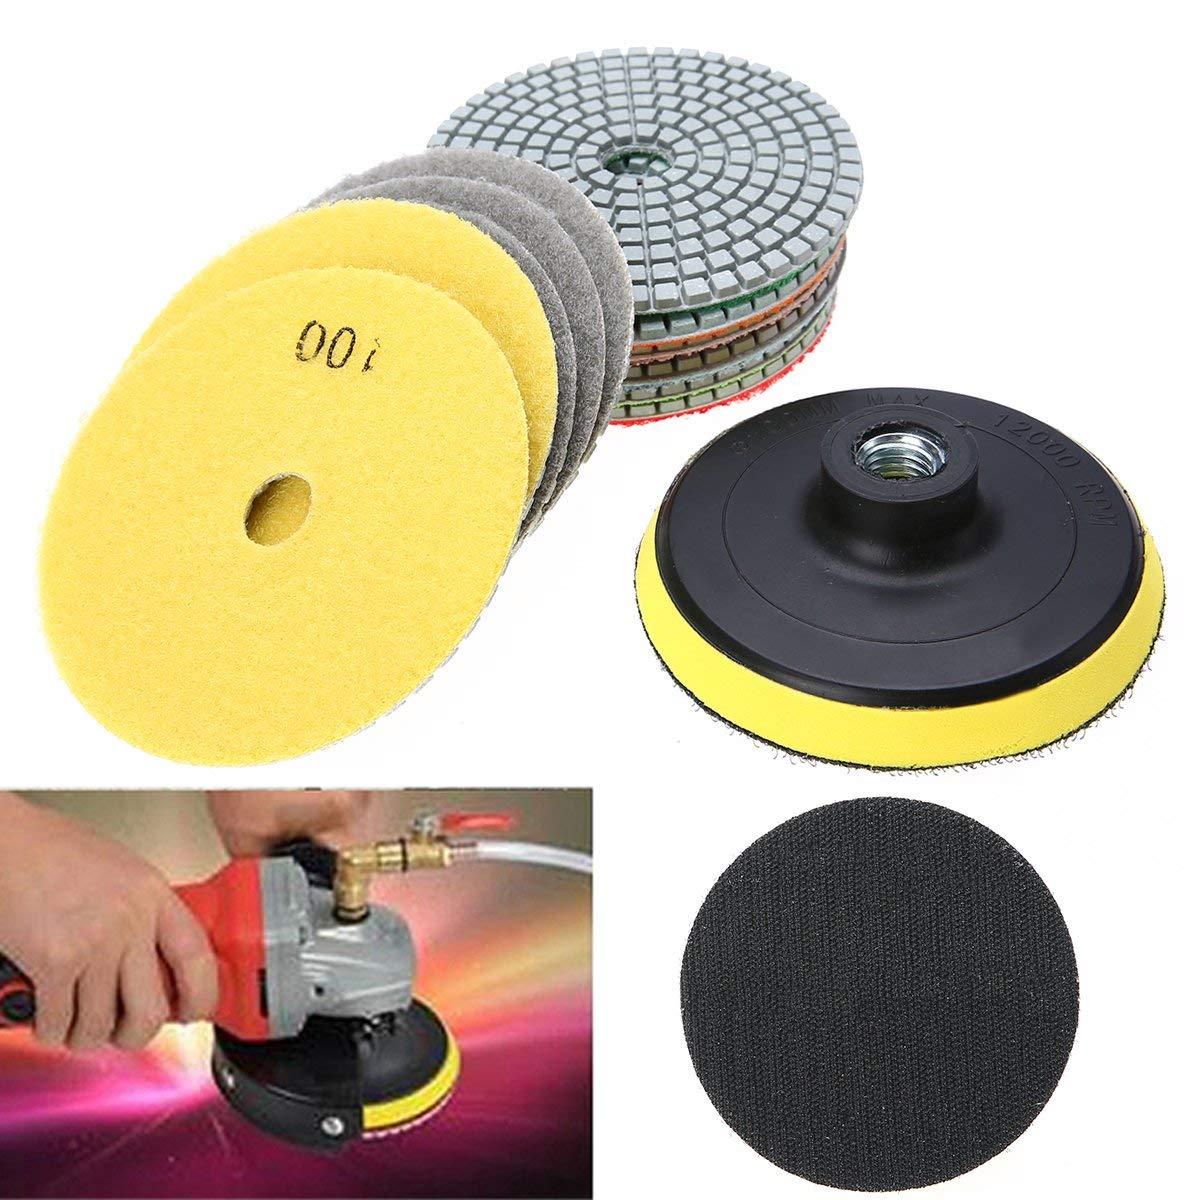 WILLAI 12pcs 4 inch Diamond Polishing Pads With Polishing Wheel Set Mayitr For Granite Concrete Marble